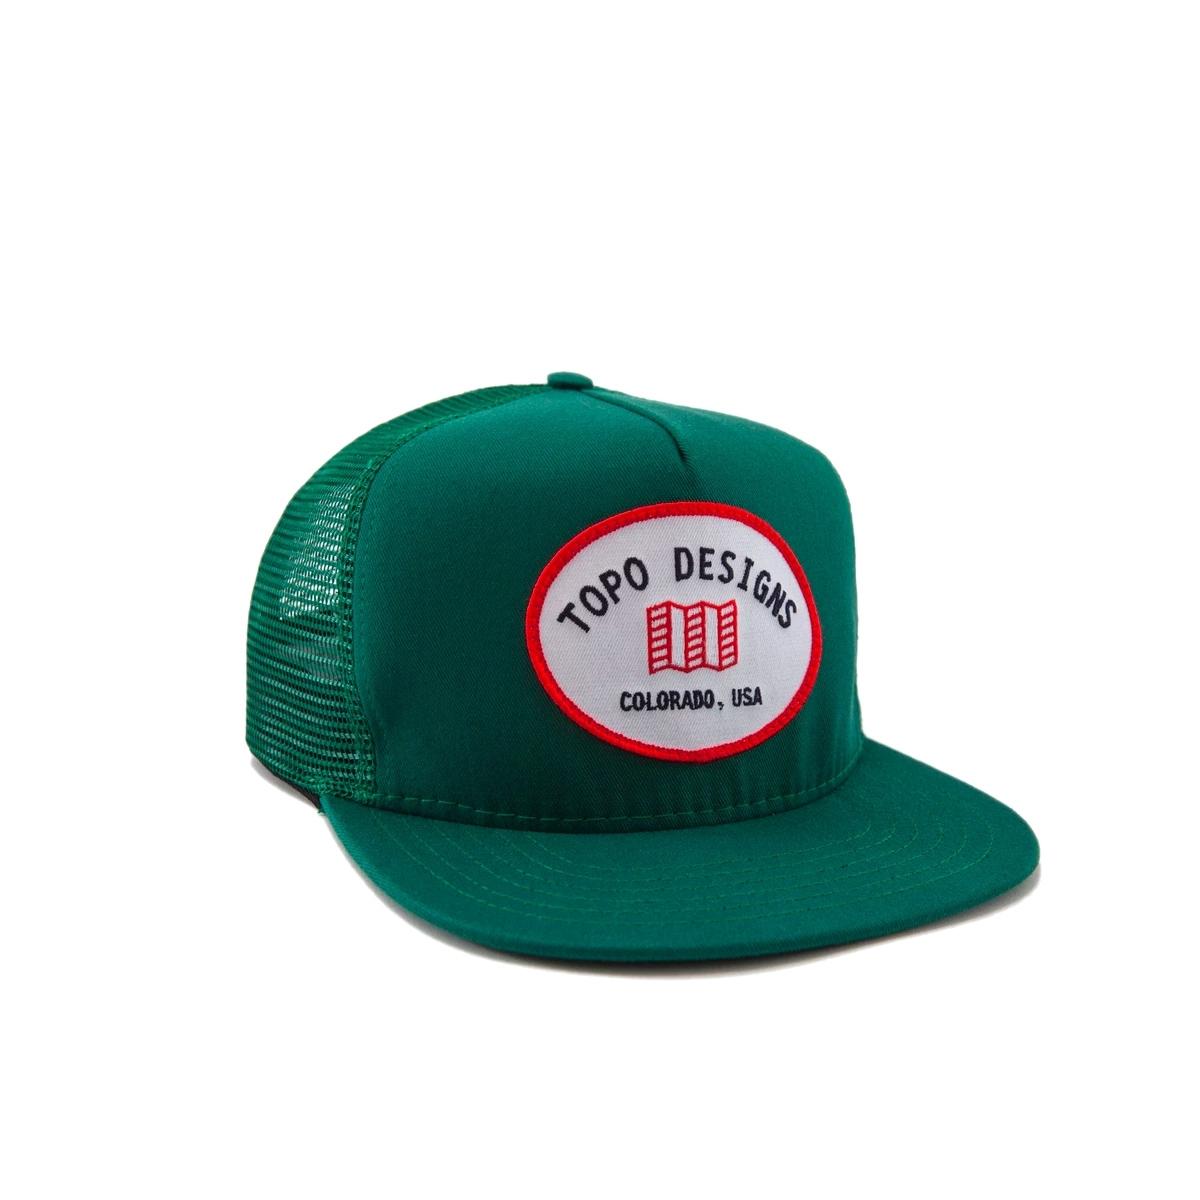 Topo Designs Snapback Hat Green